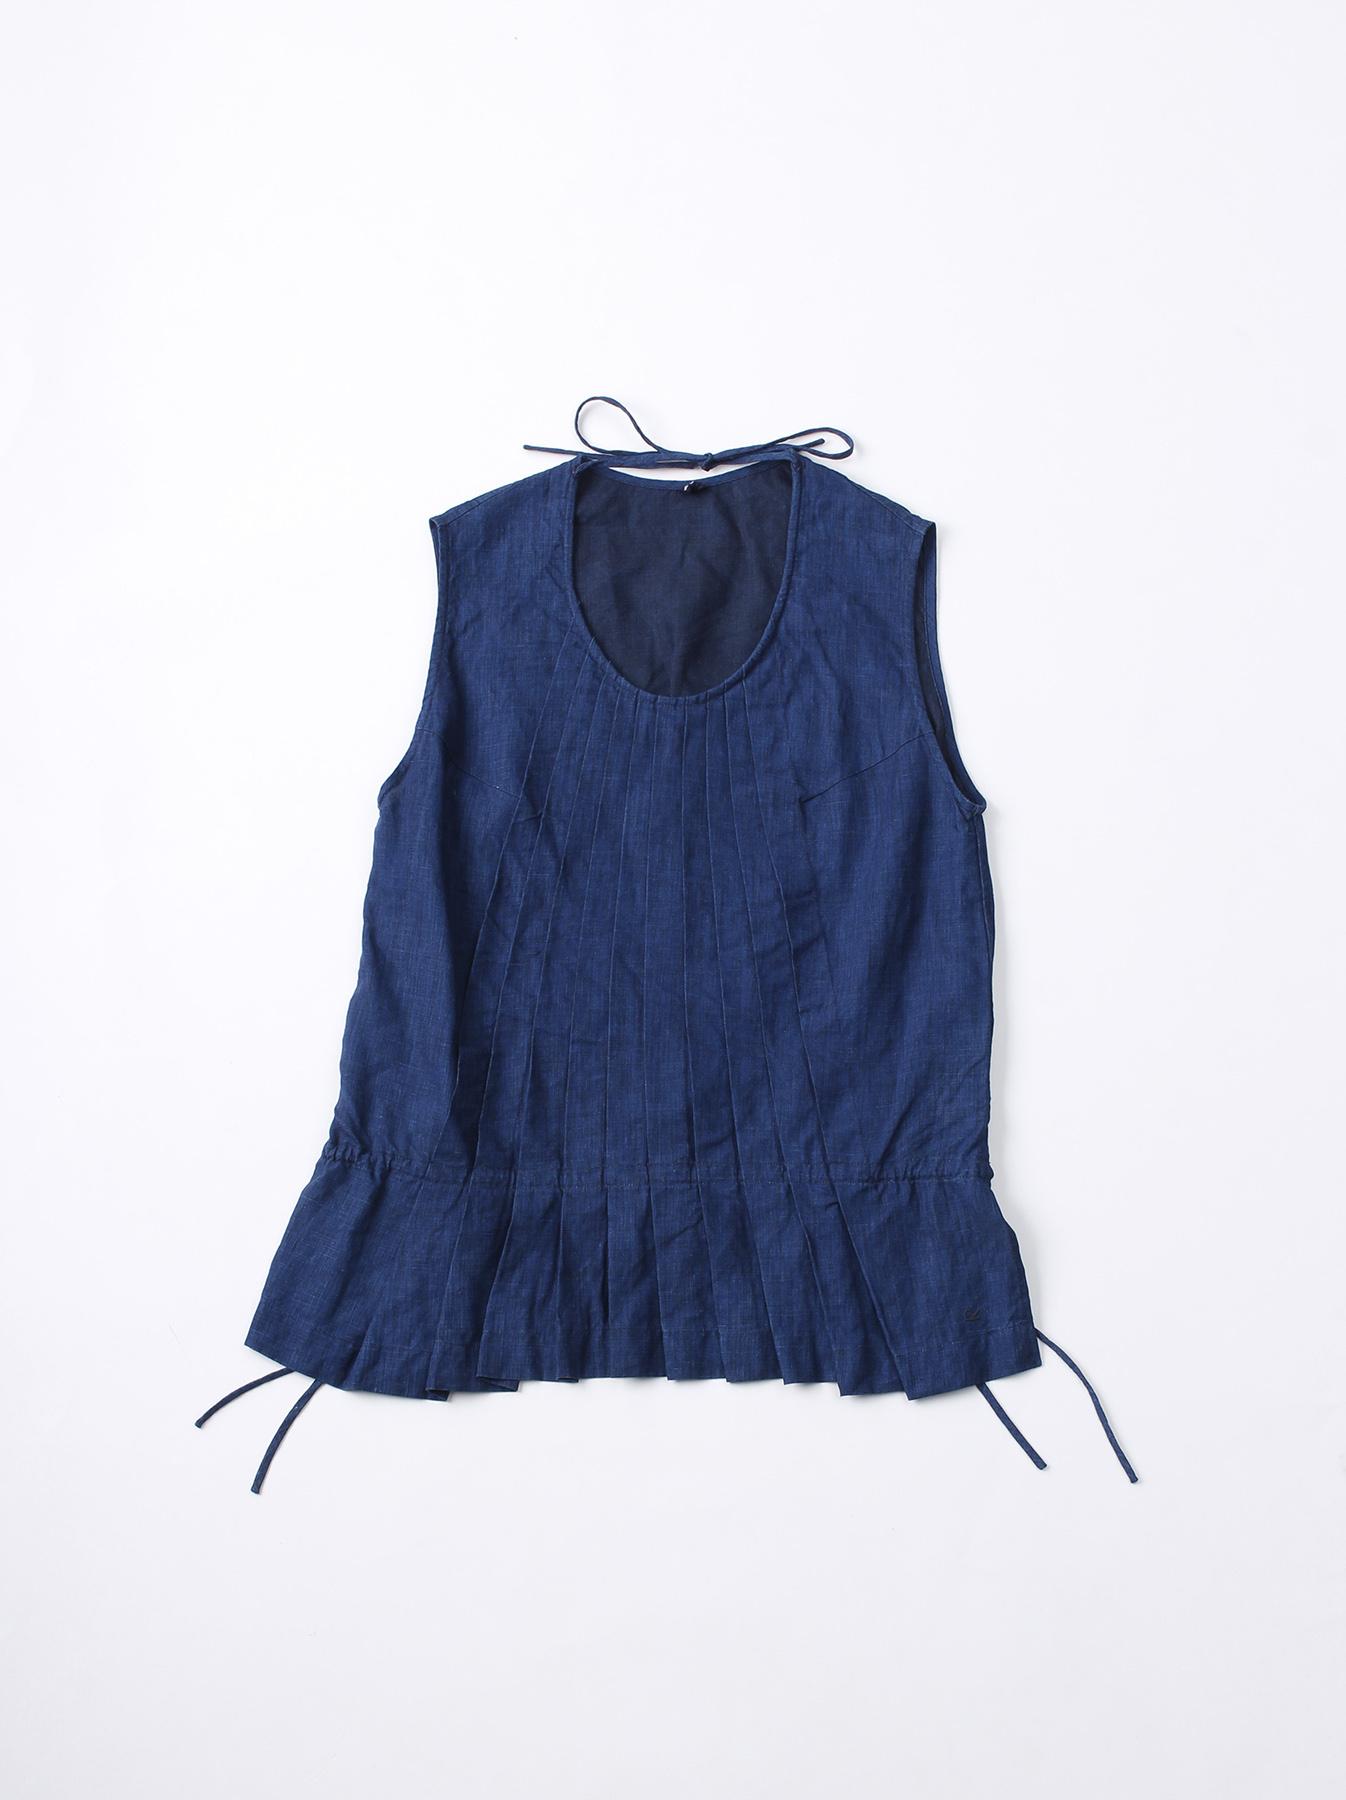 WH Indigo Linen Sleeveless Tuck Blouse-1